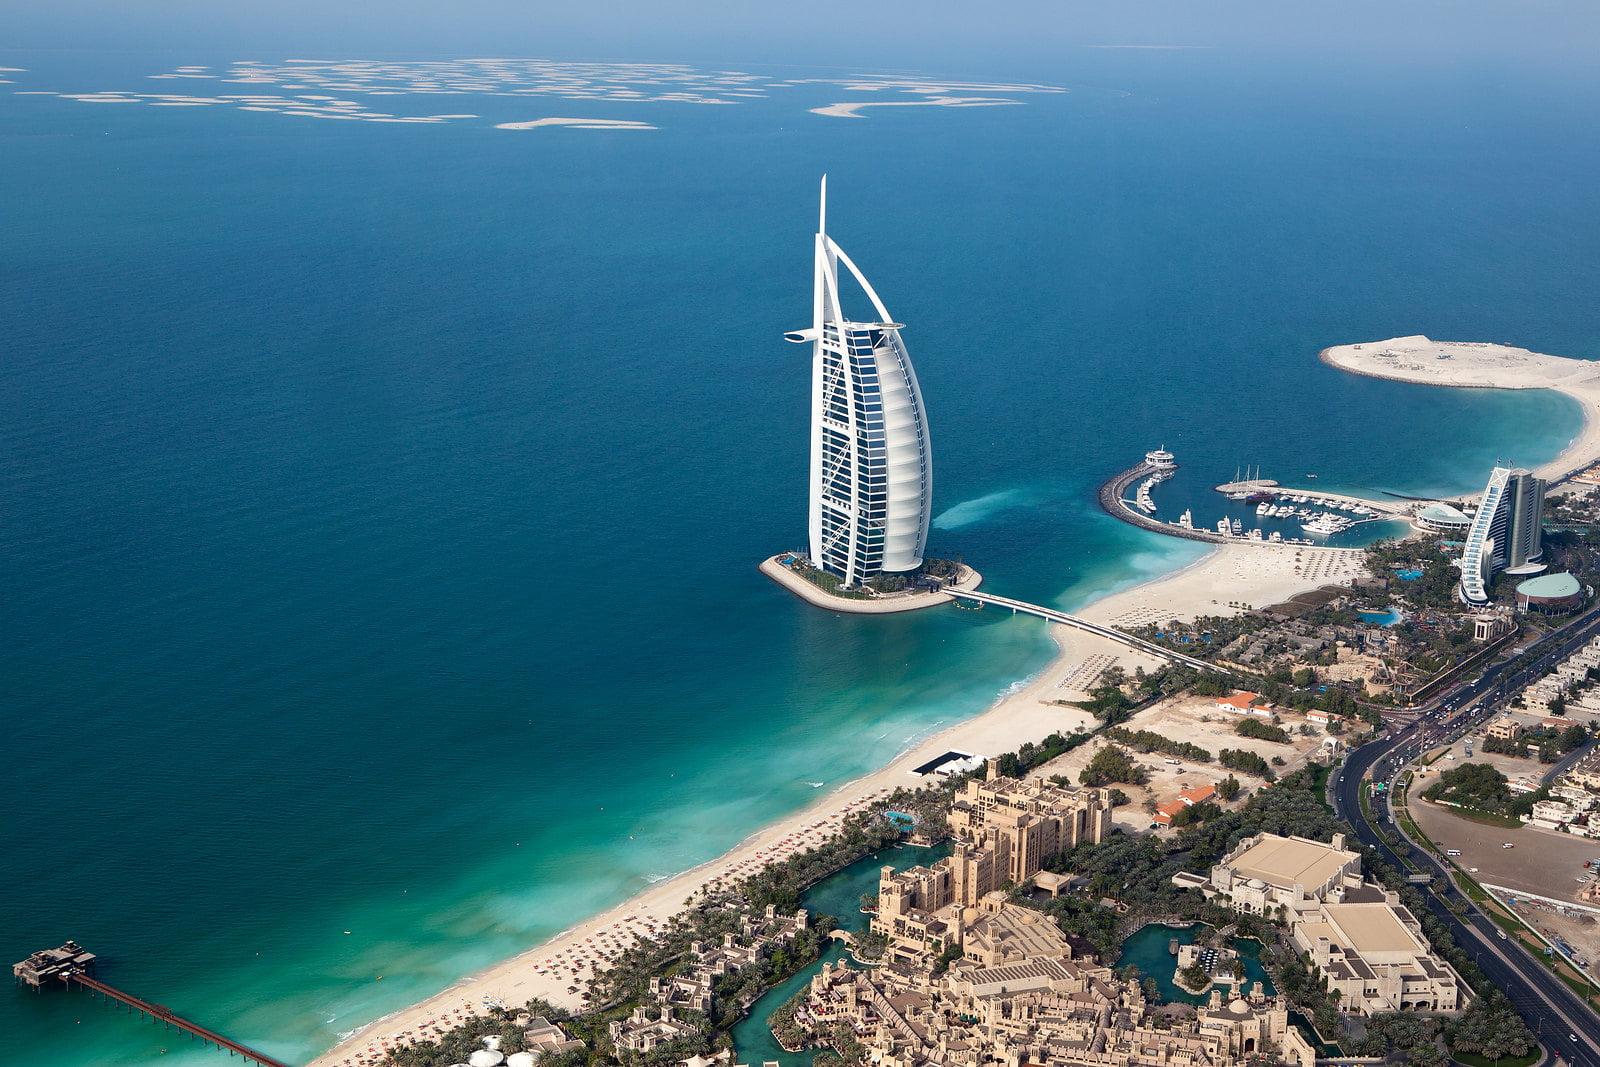 Dubai - Burj Al Arab - Helicopter View - photo by Sam valadi under CC BY 2.0